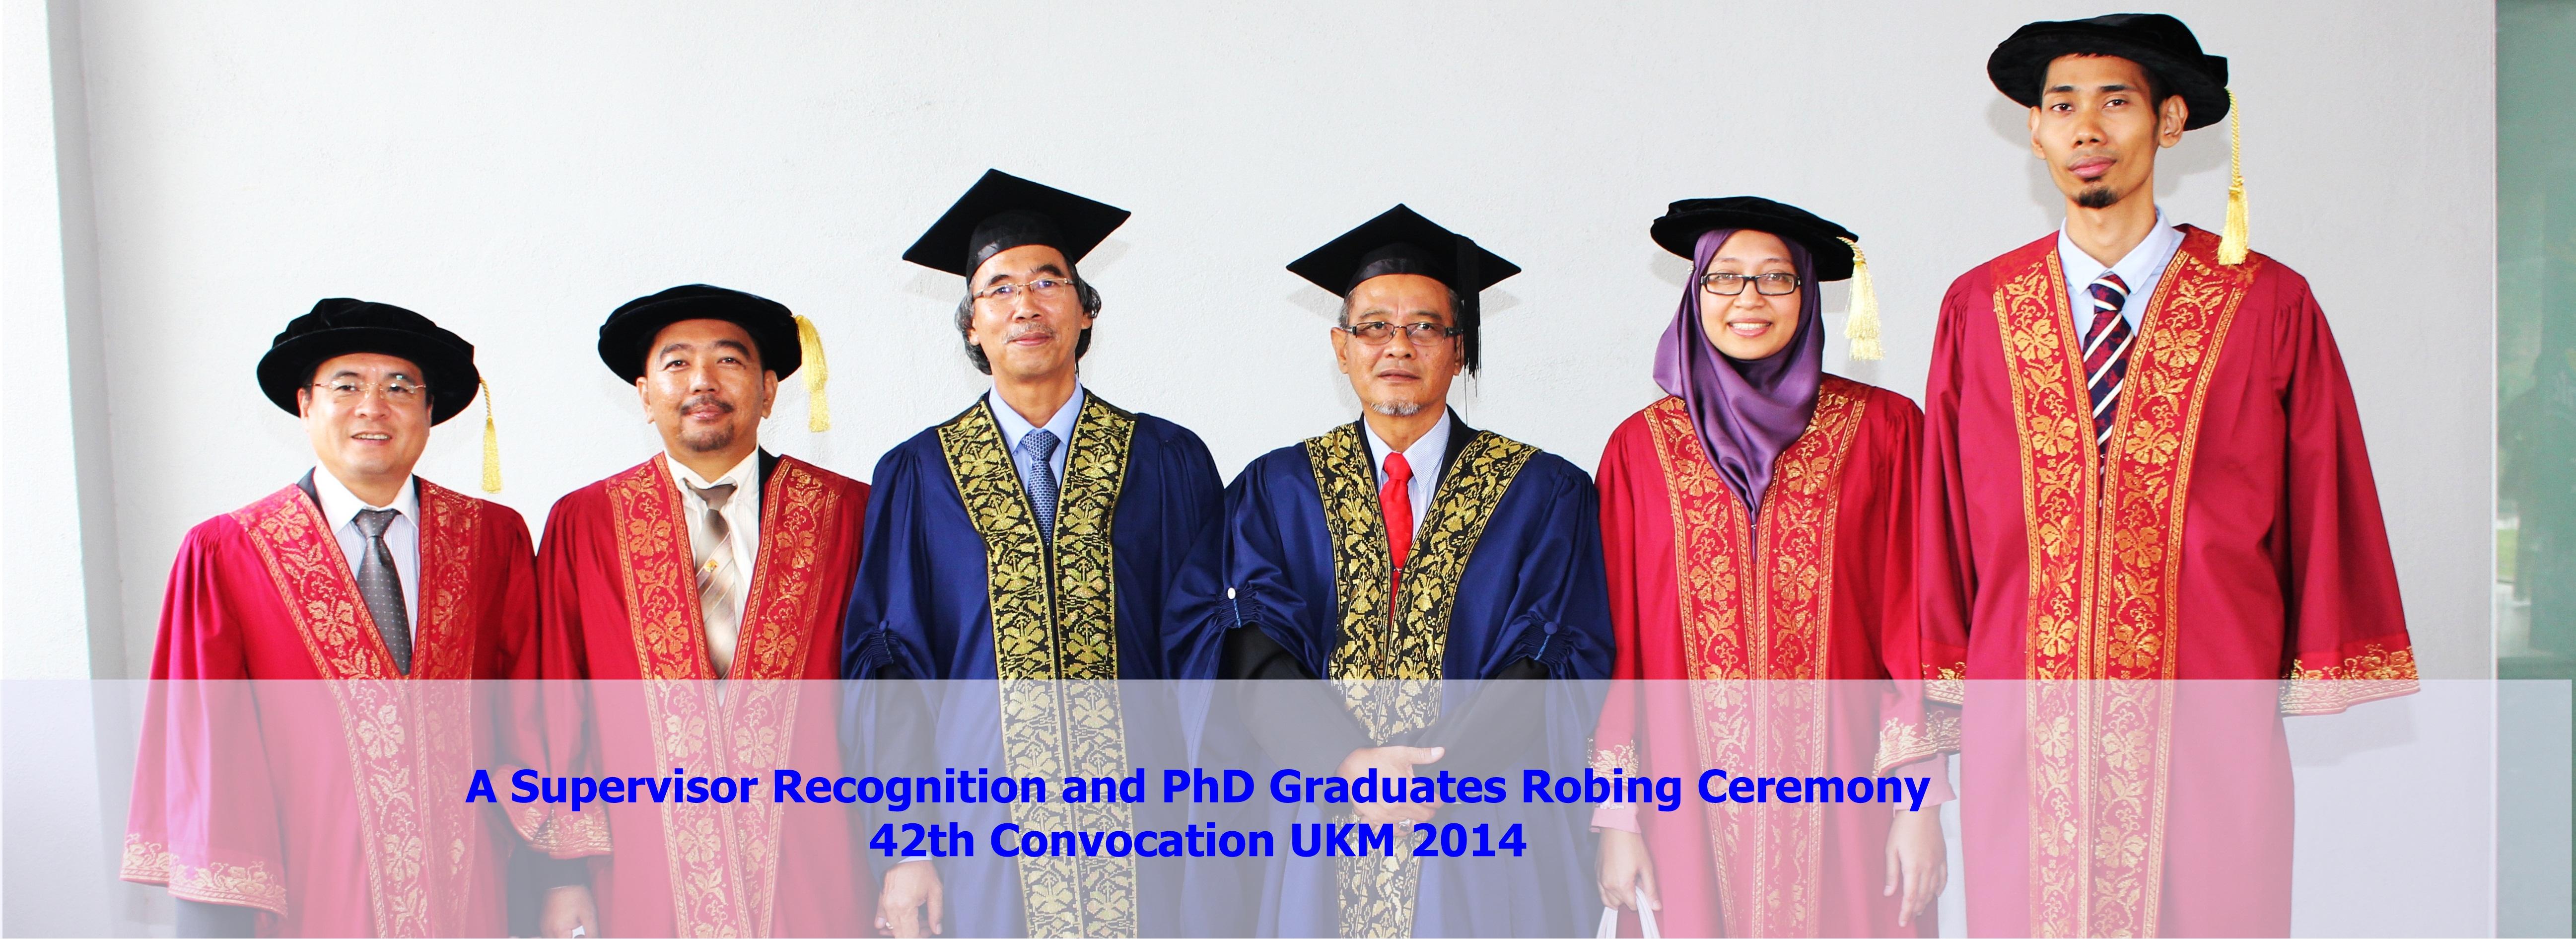 Convocation UKM 2014